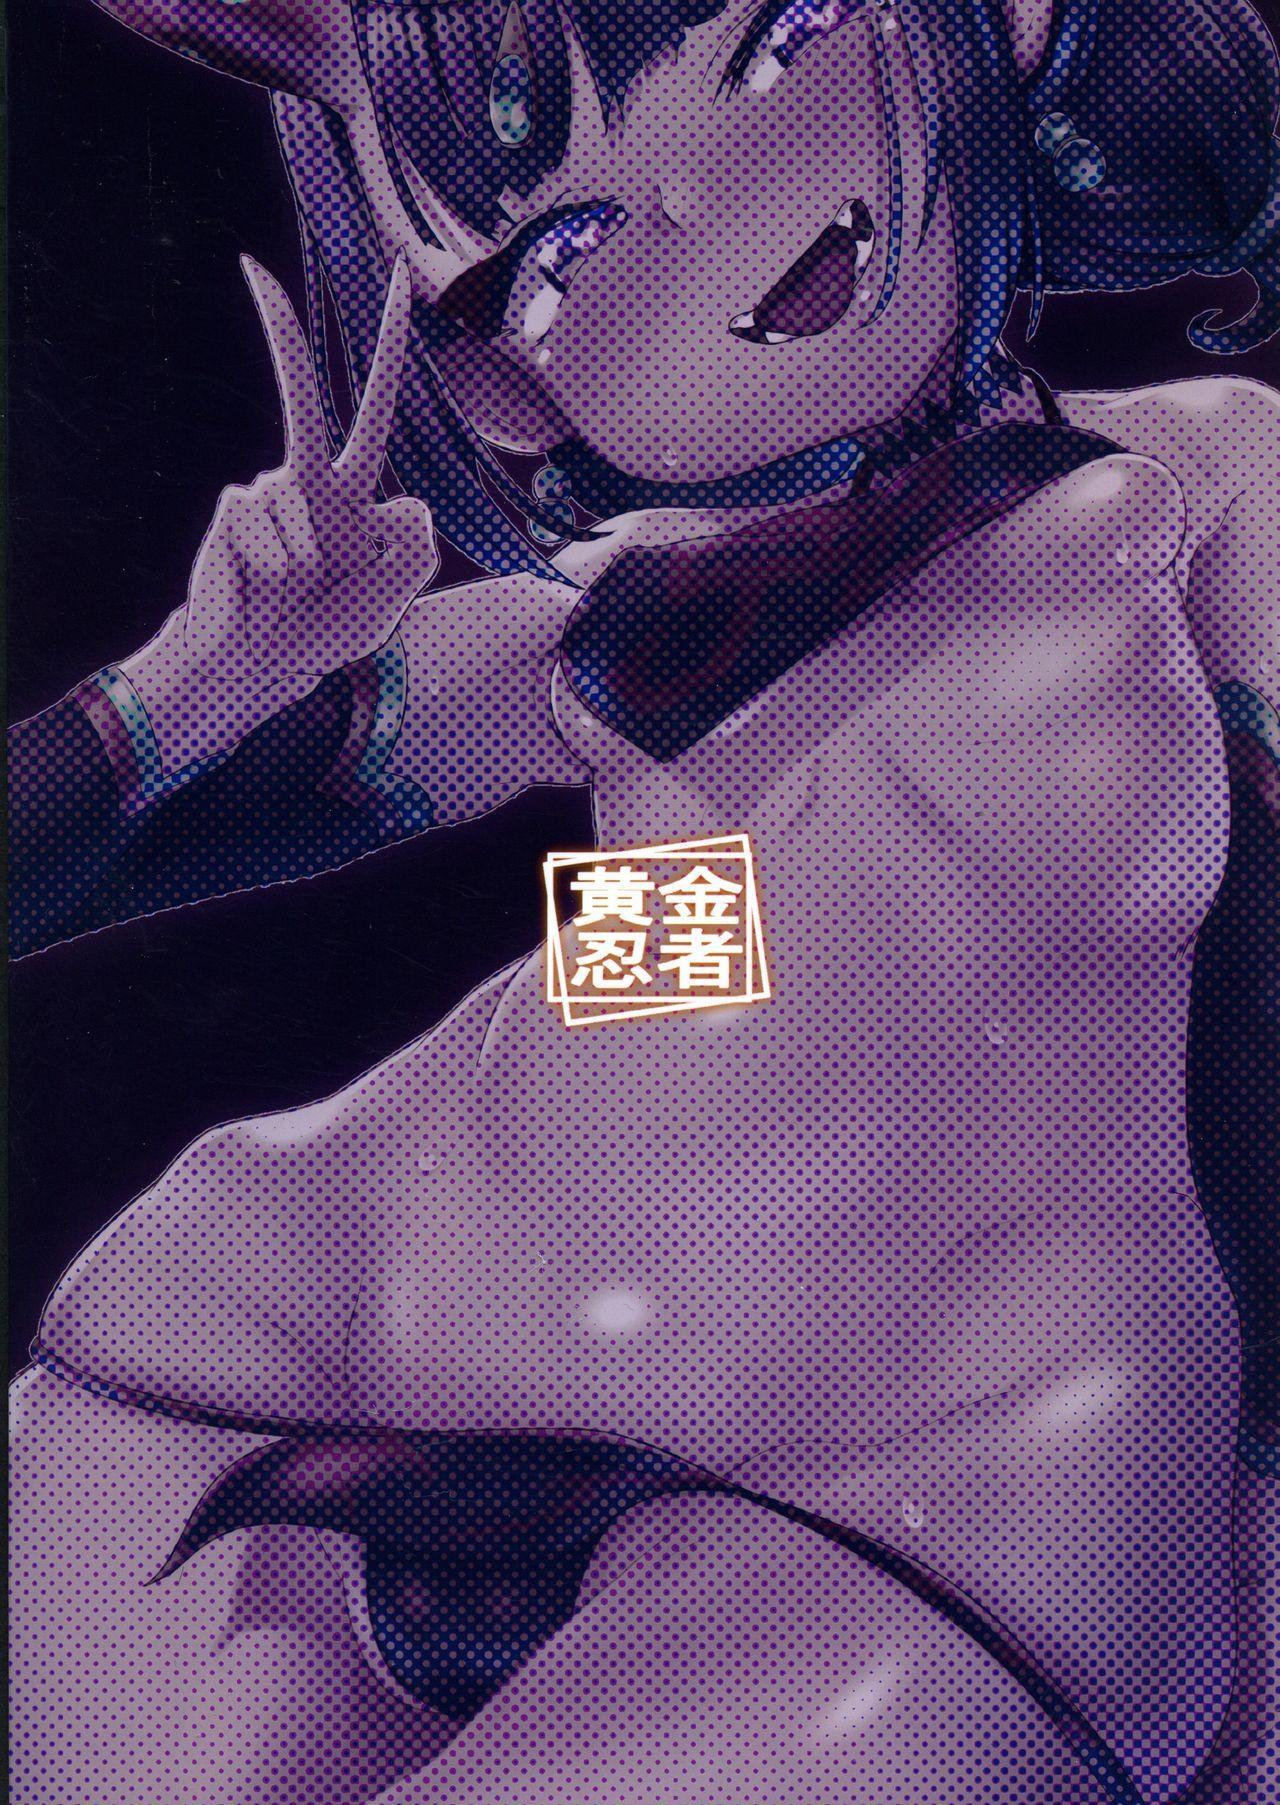 Ichaicha Shuten-chan 2